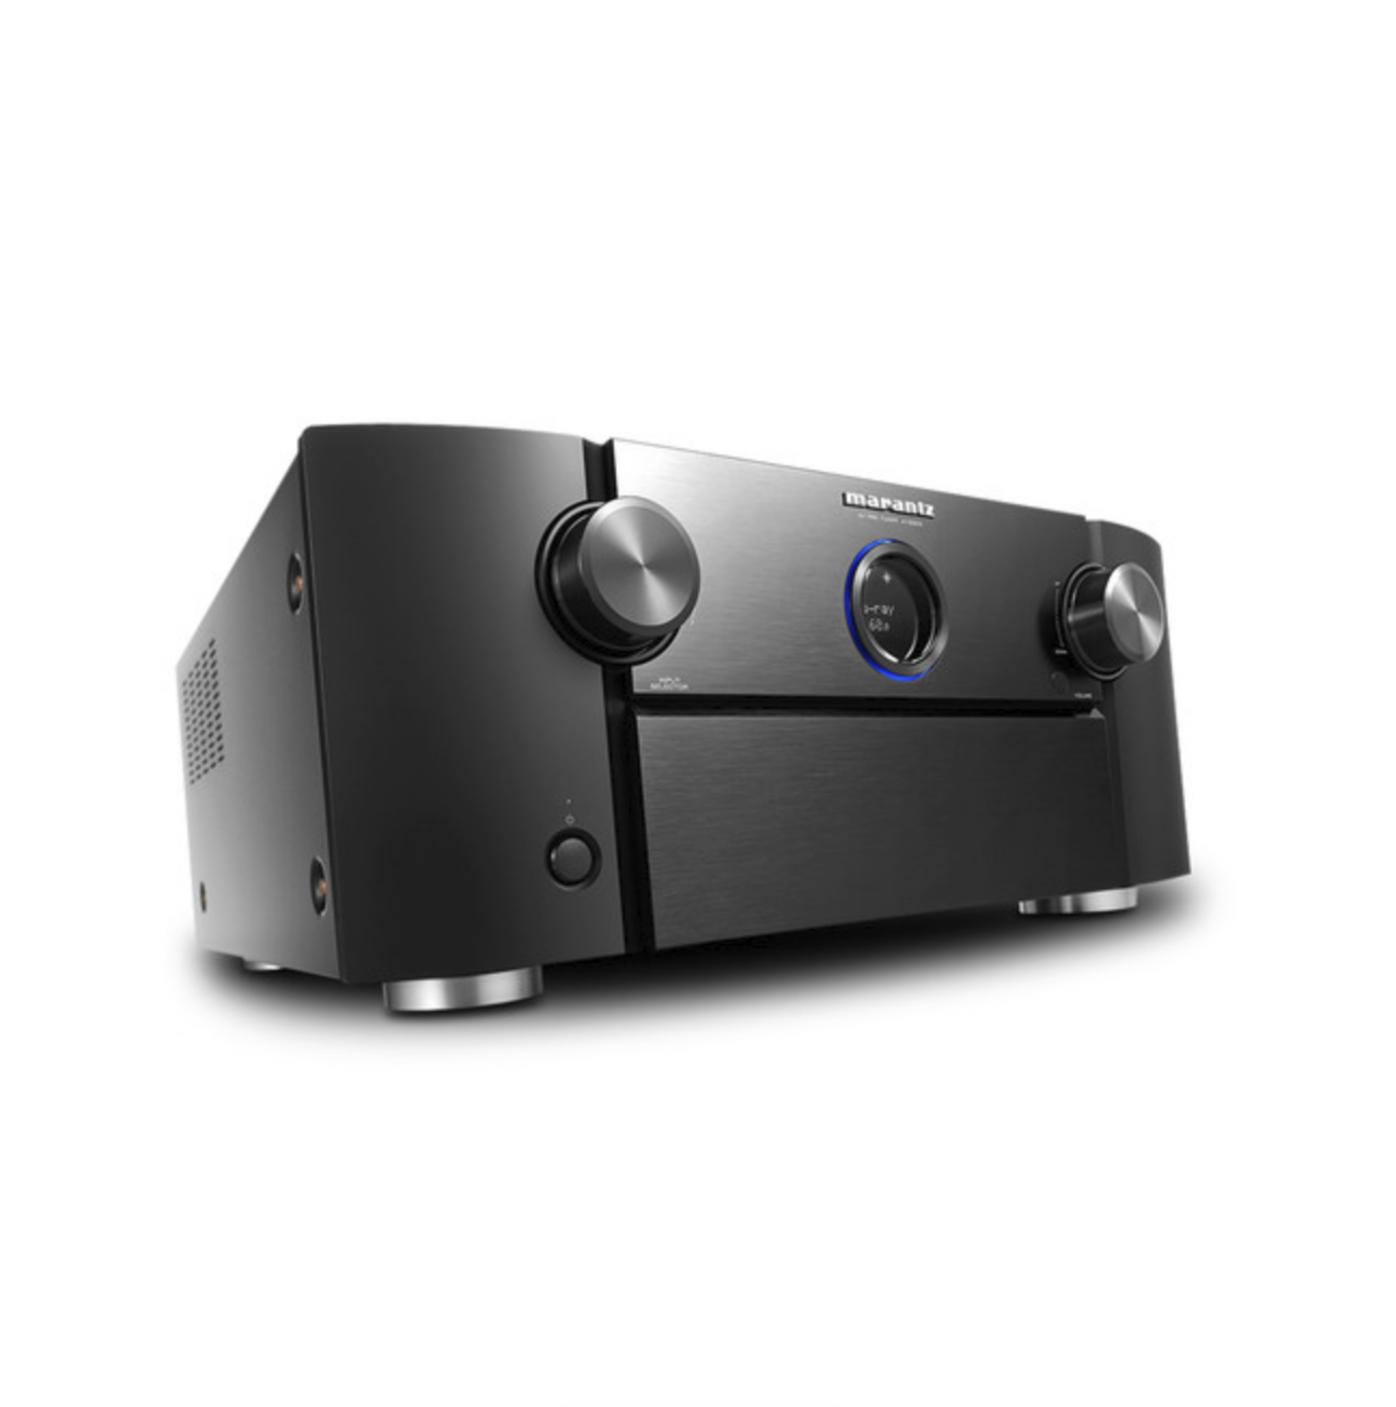 Pré Amplificador Marantz Av8805 Dolby Atmos, Dts:x 13.2 Ch